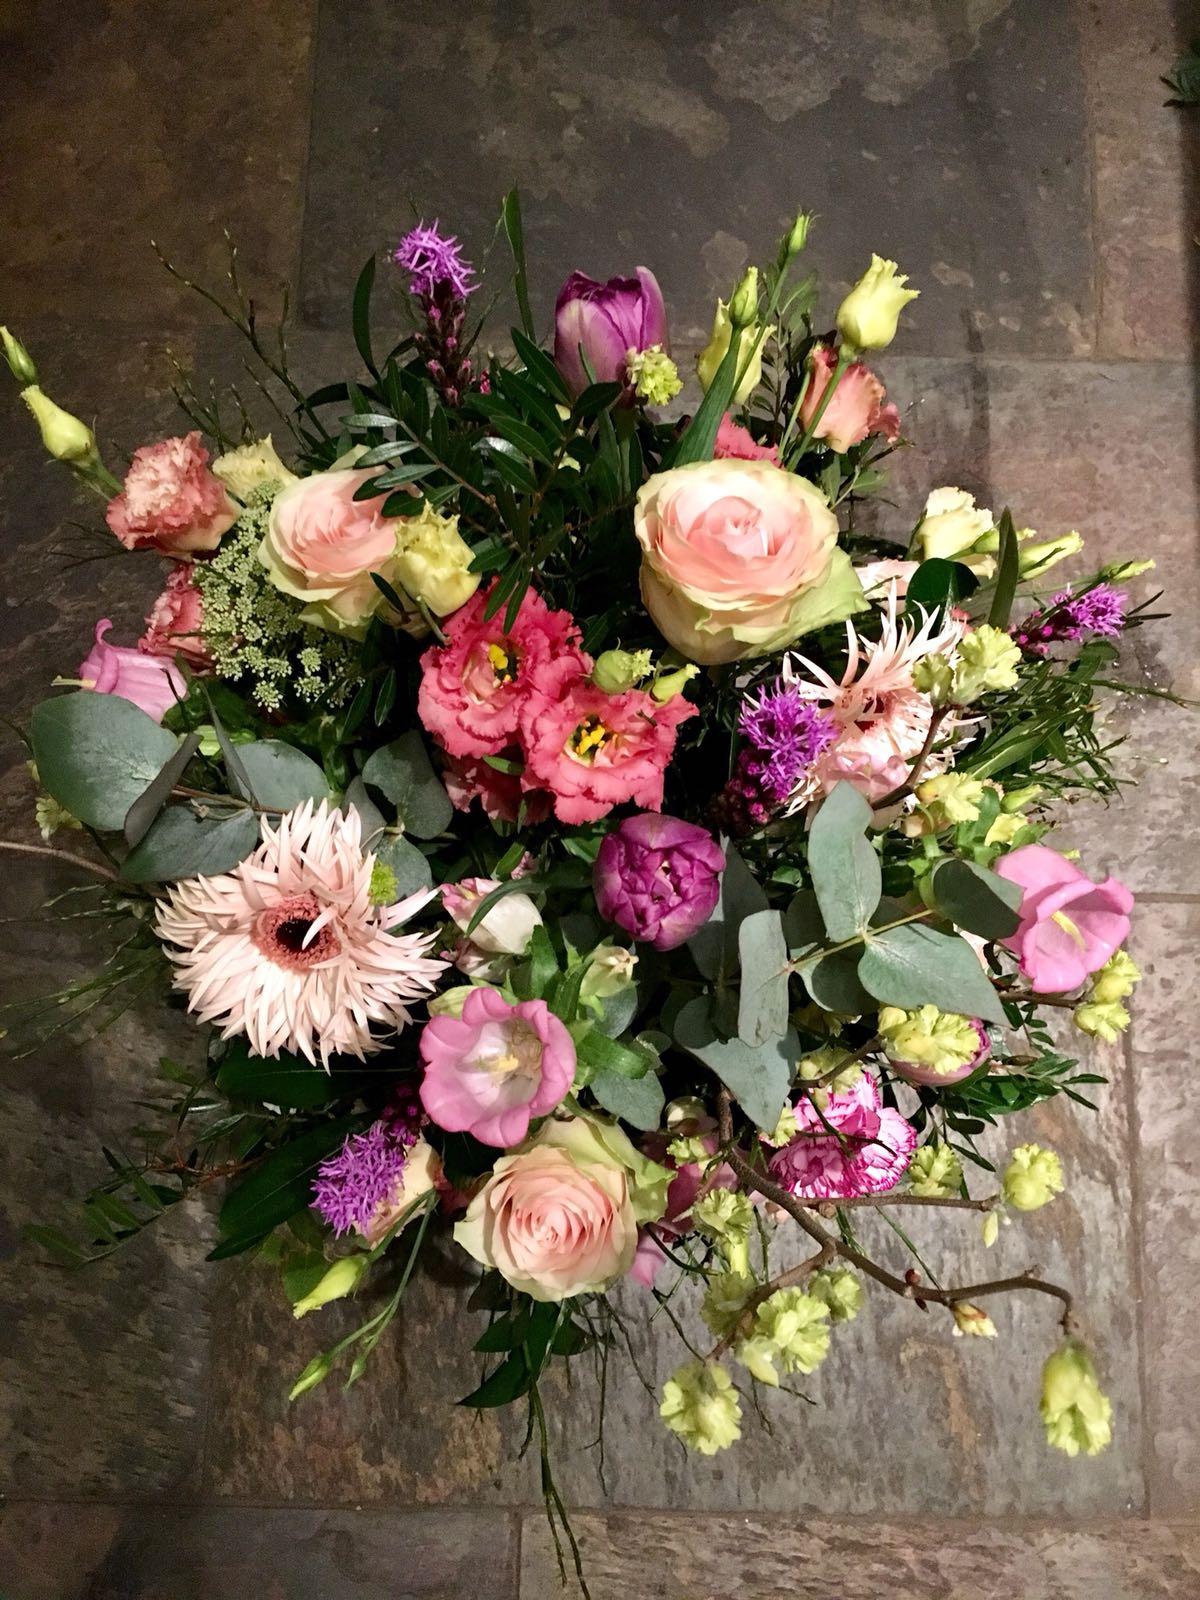 Livraison Fleurs Geneve | Pearl Fleuriste